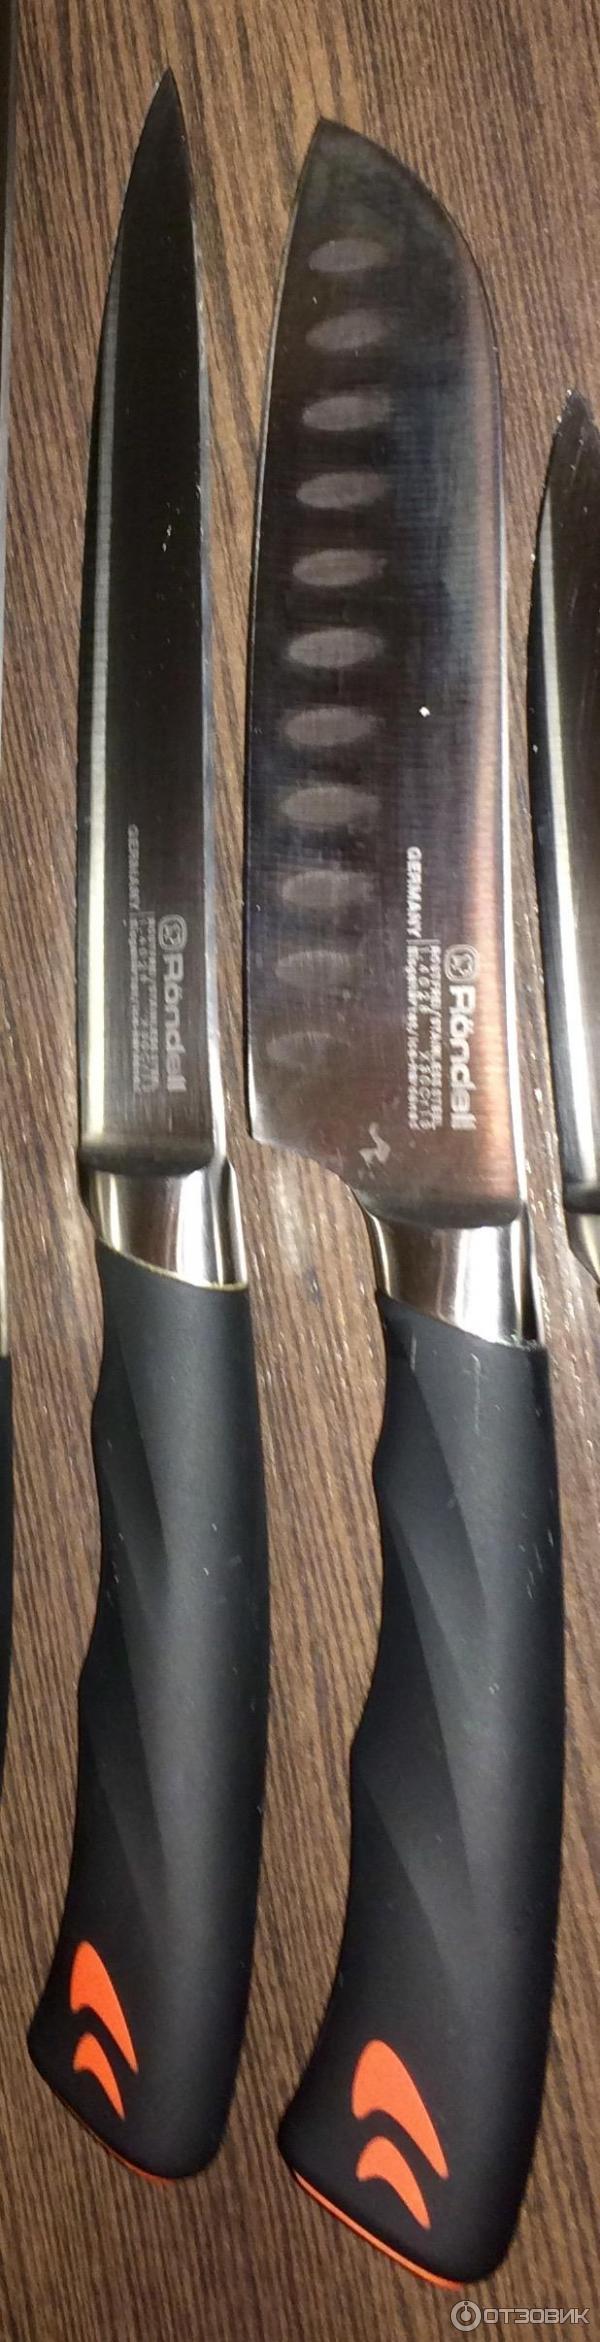 Набор ножей Rondell